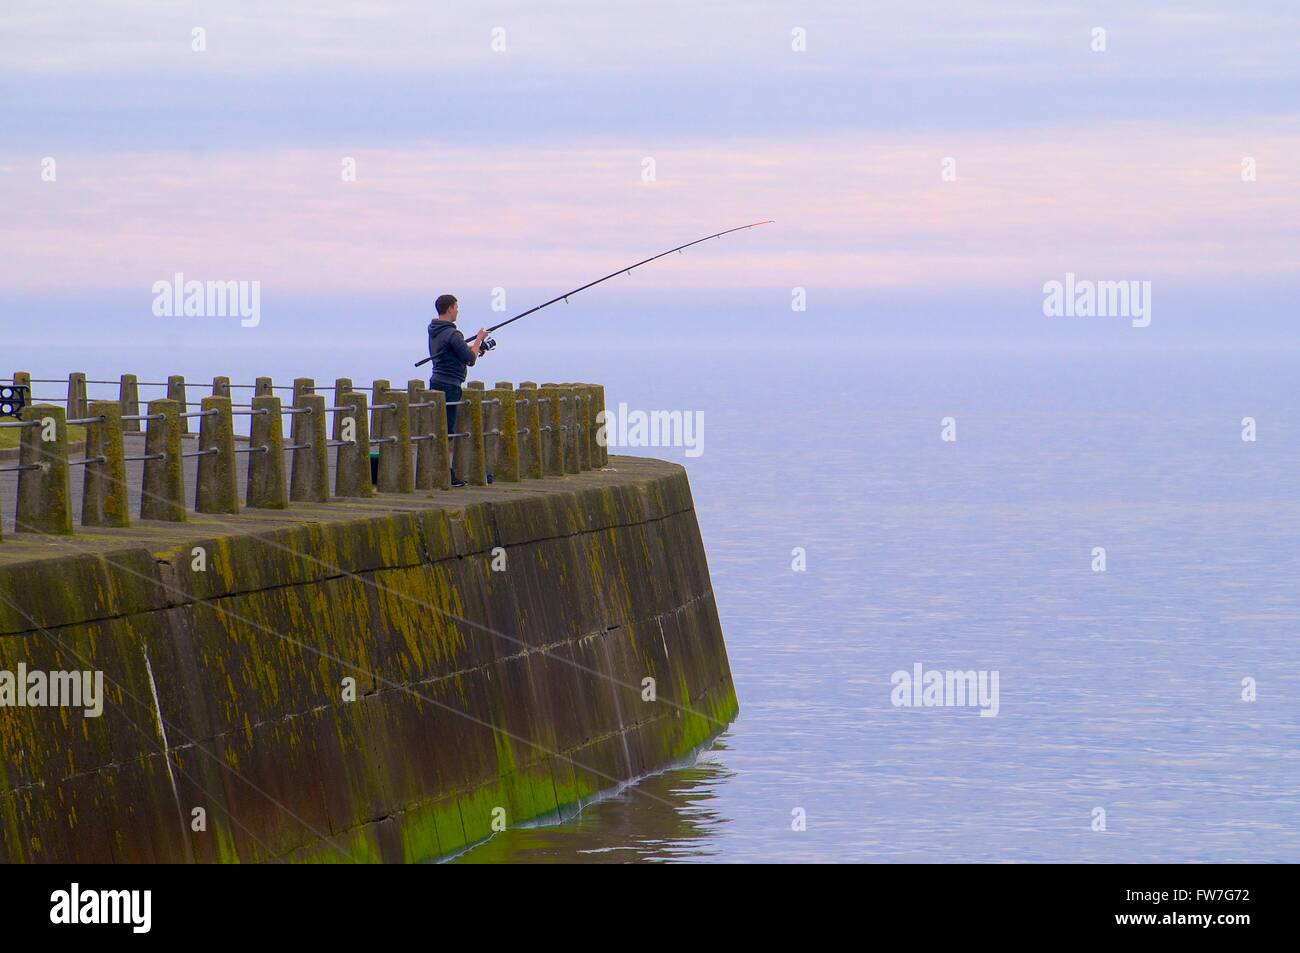 Sea fisherman fishing of the sea wall. Evening. Silloth, Cumbria, England, United Kingdom, Europe. - Stock Image